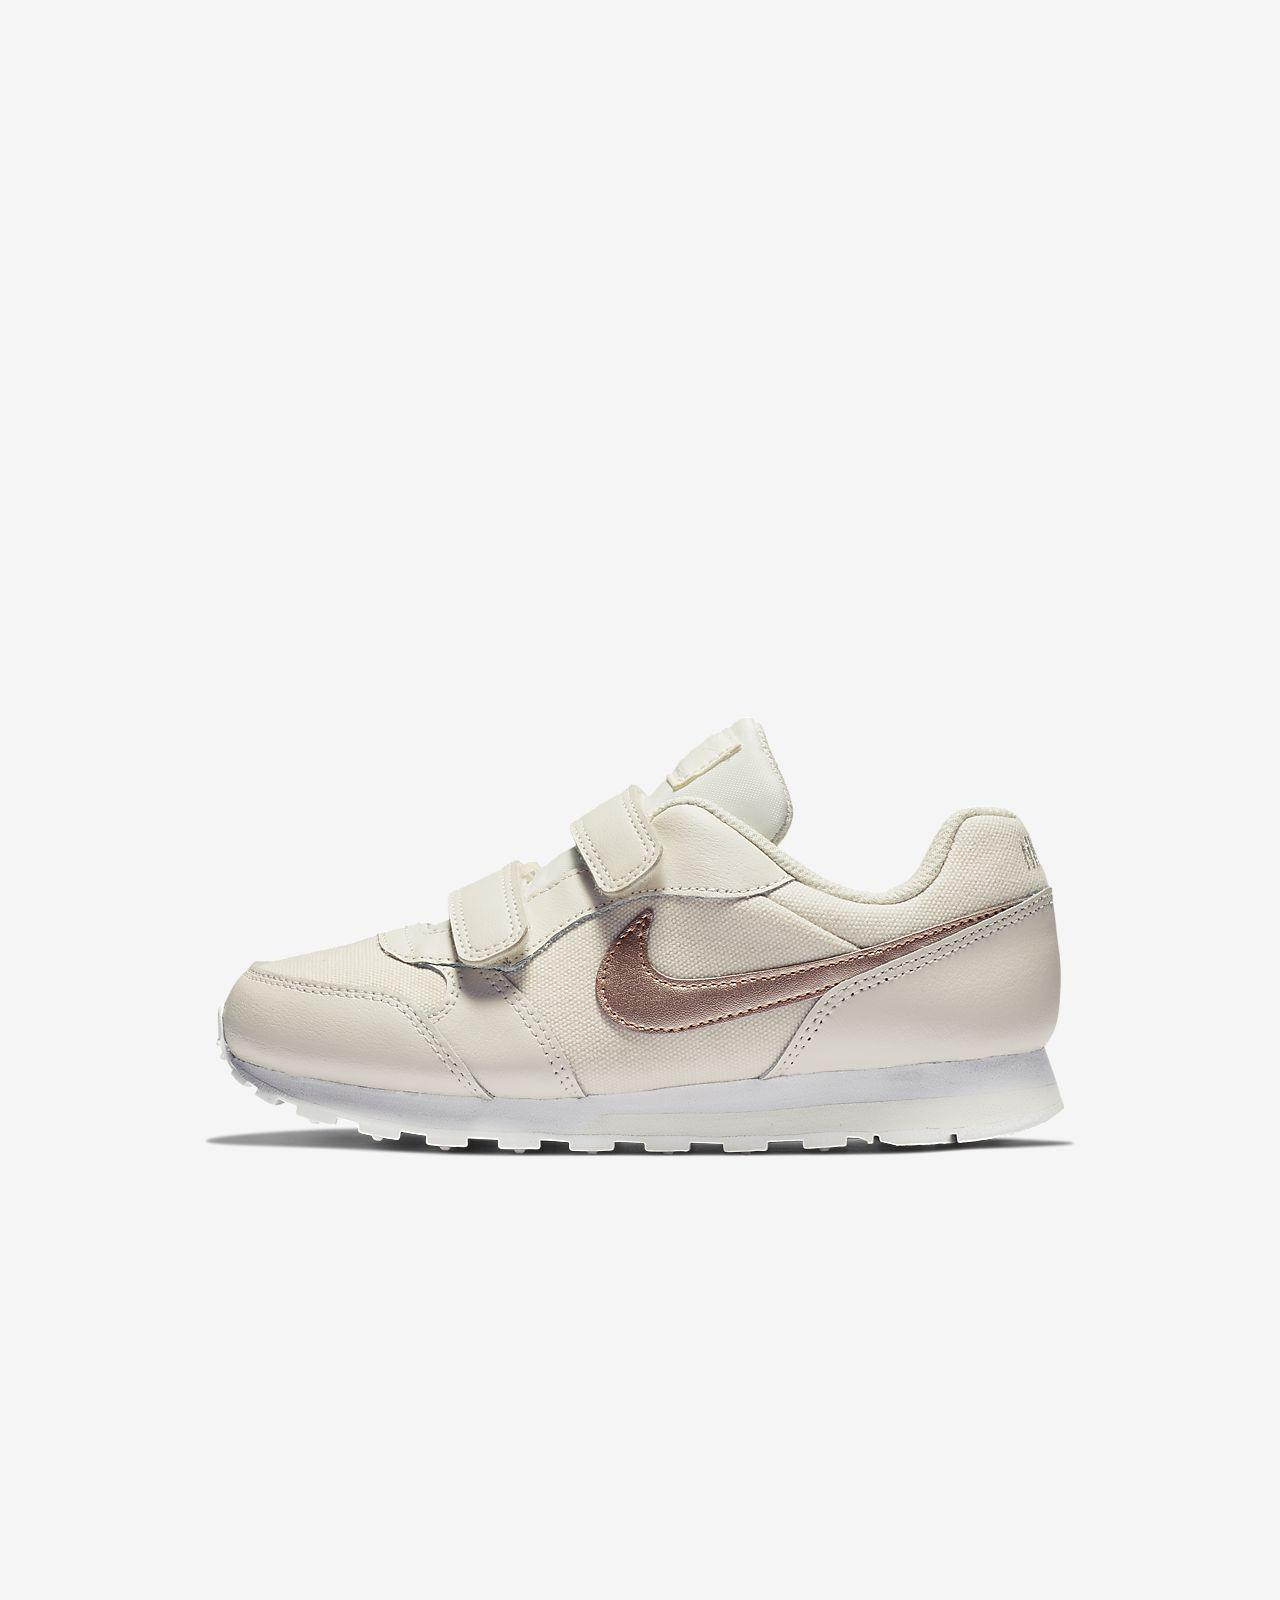 8027b271bbd18c Nike MD Runner 2 Younger Kids  Shoe. Nike.com FI